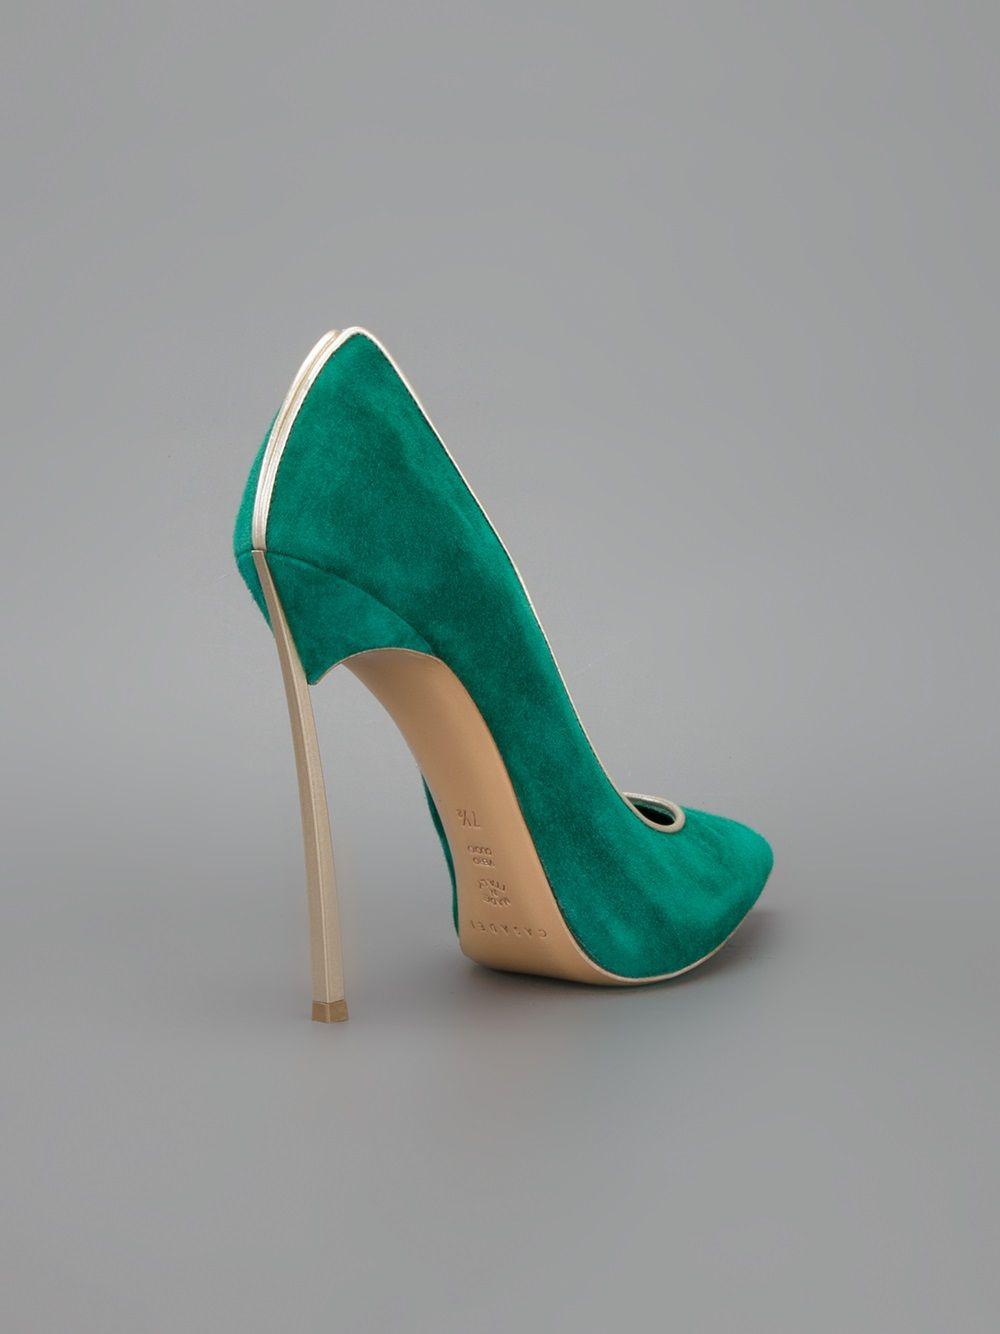 8e6e6df06b7 Casadei Sapato Verde. - Biondini - Farfetch.com